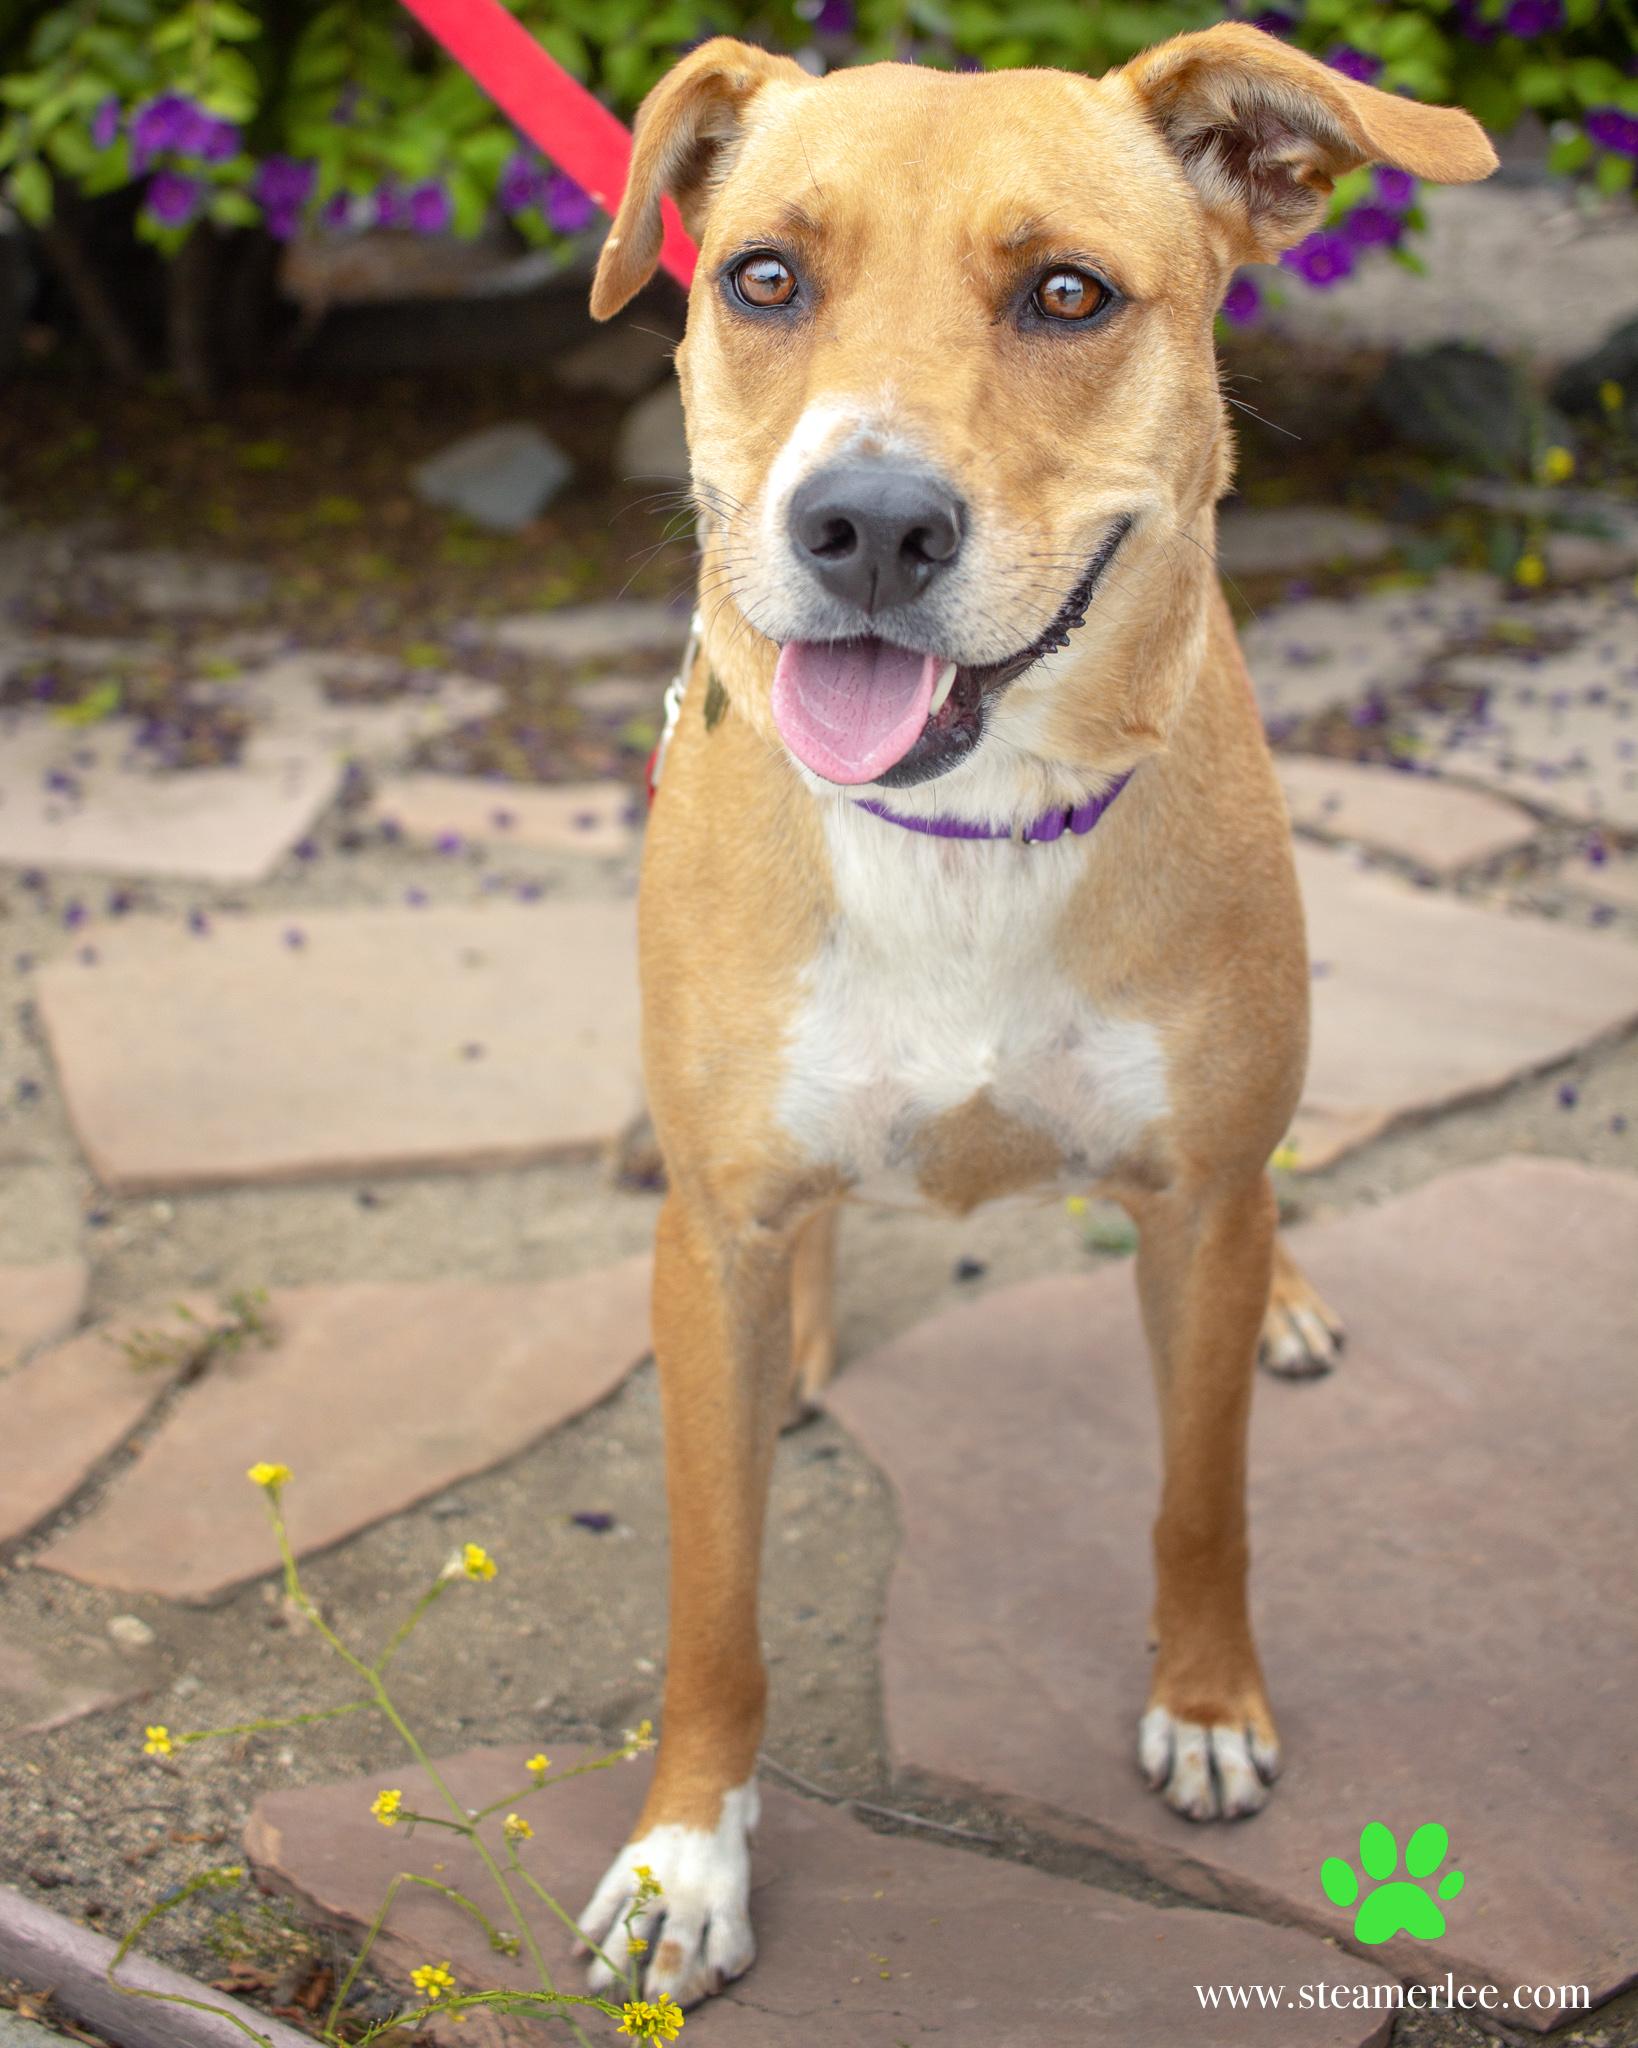 438-Orange-County-Dog-Photography-Steamer-Lee-Southern-California-SBACC.JPG